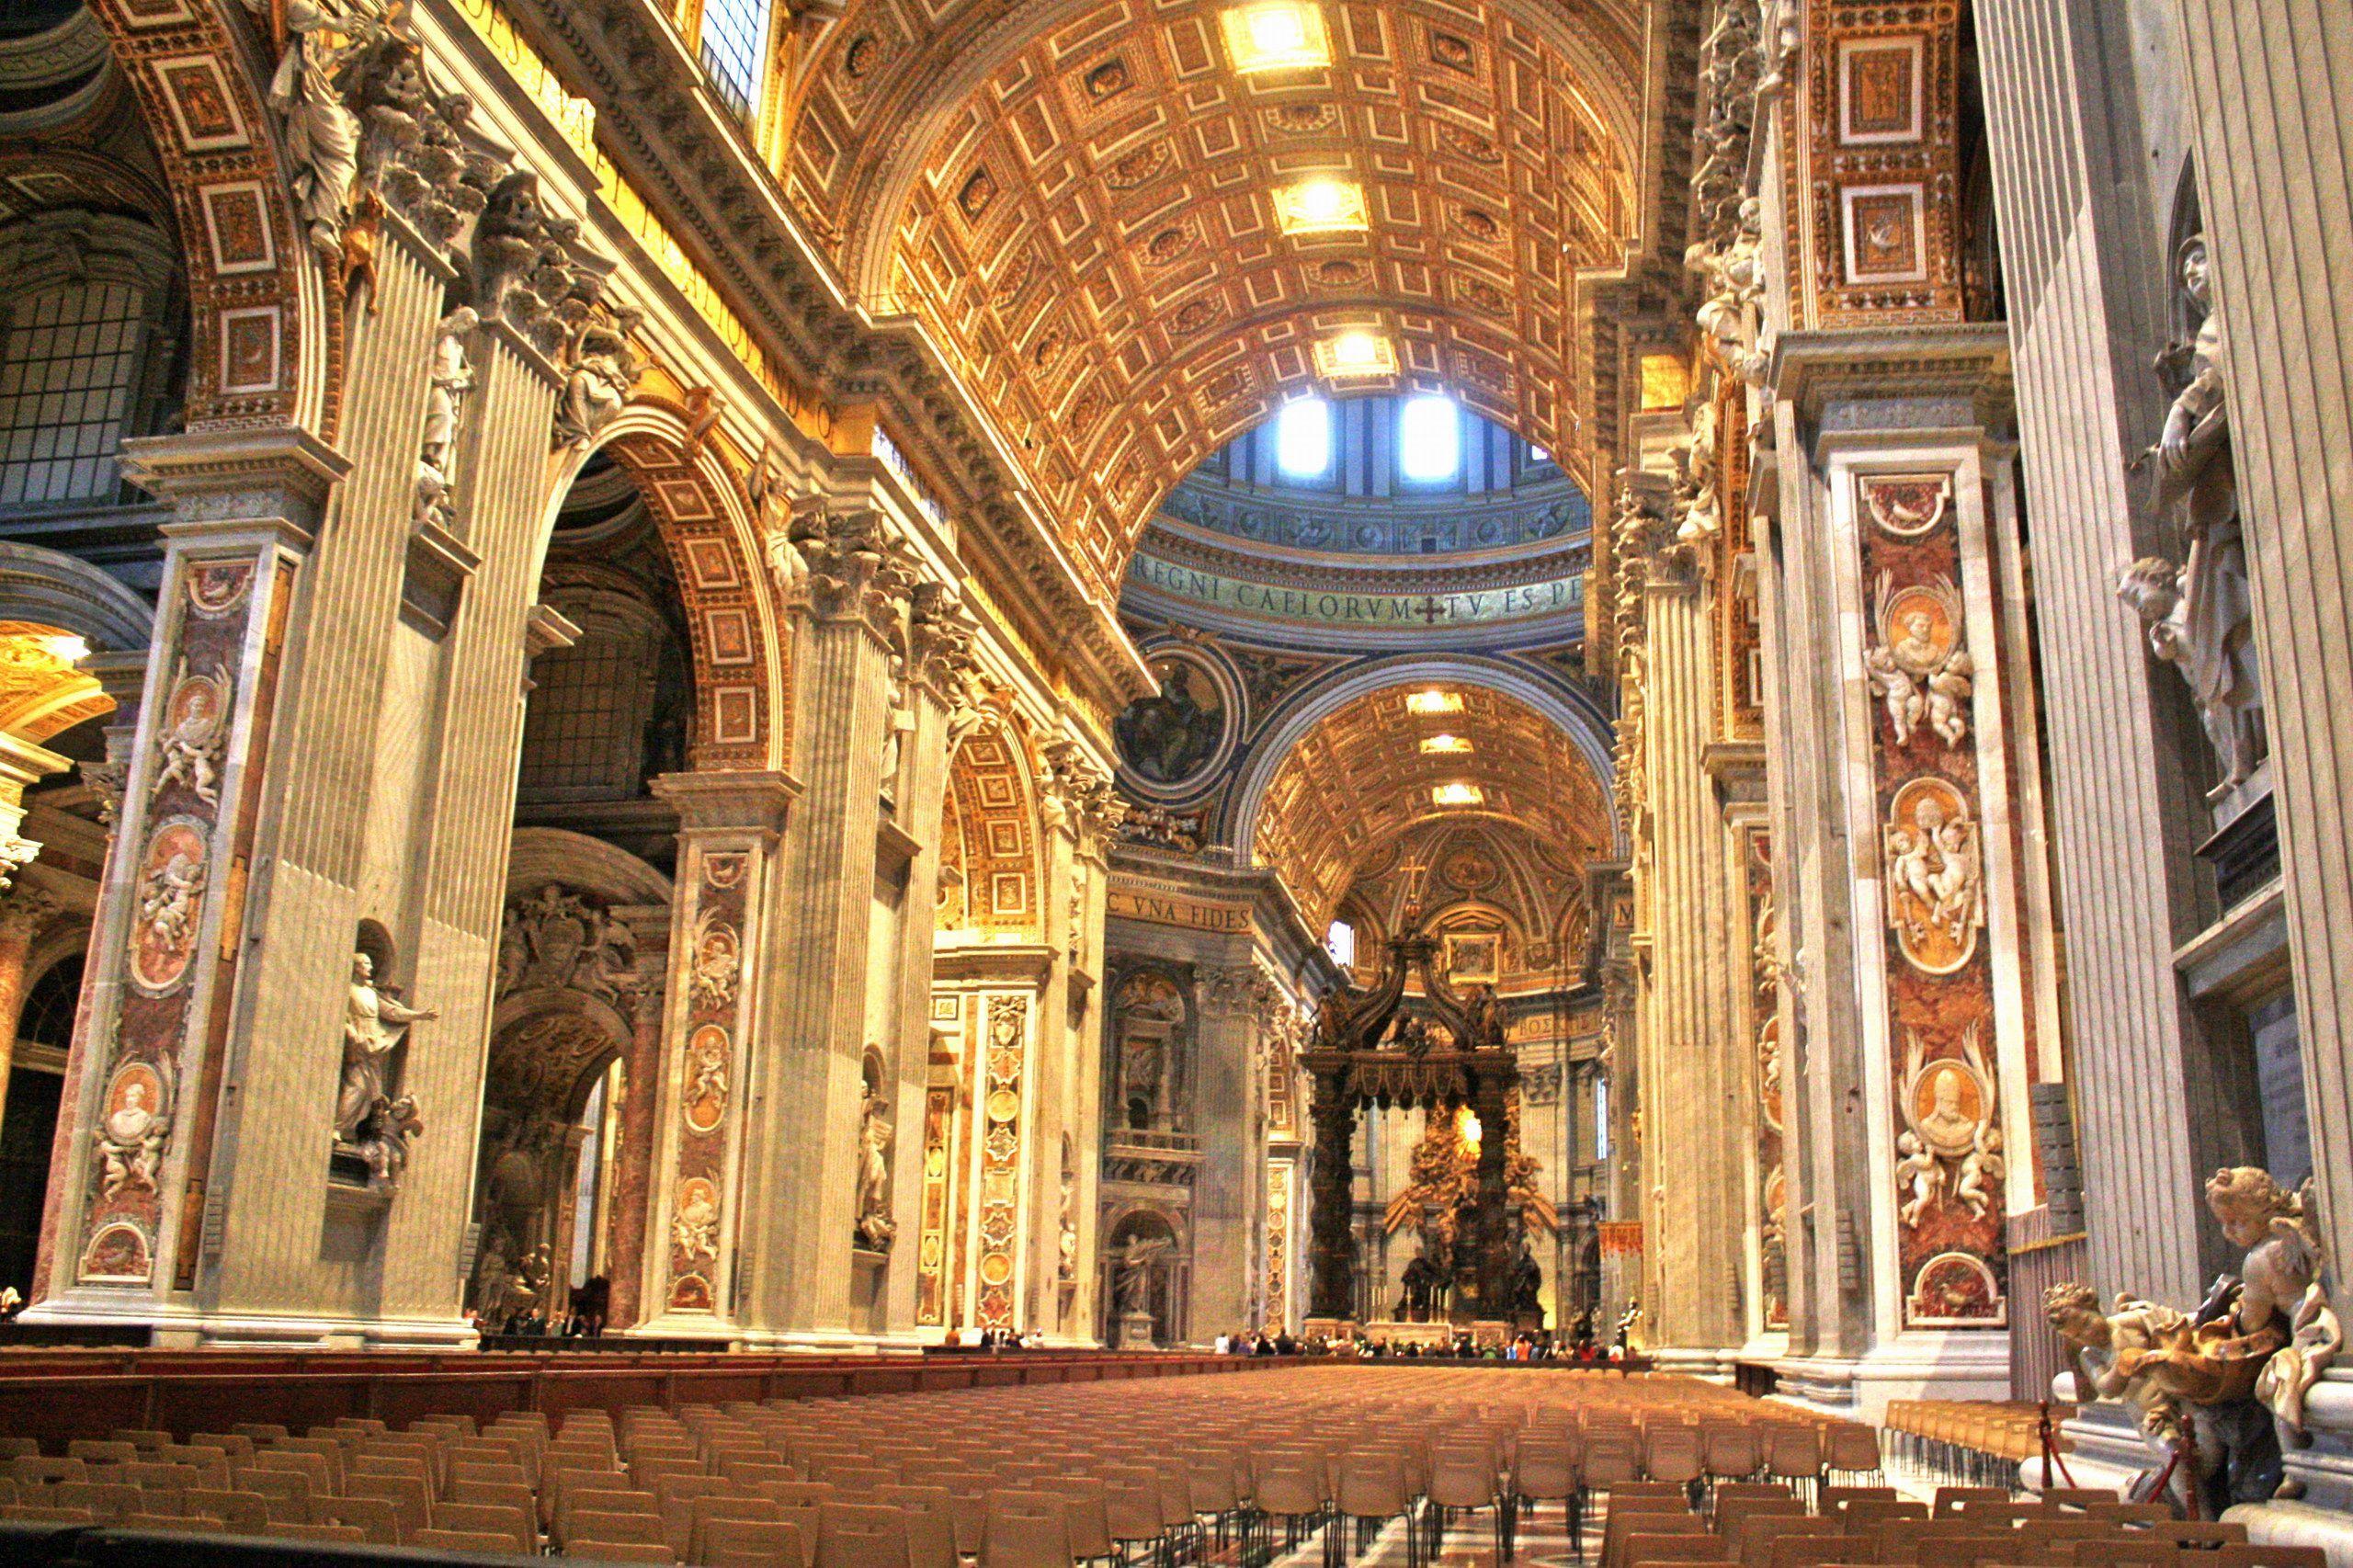 St. Peter's Basilica Vatican City St peters basilica